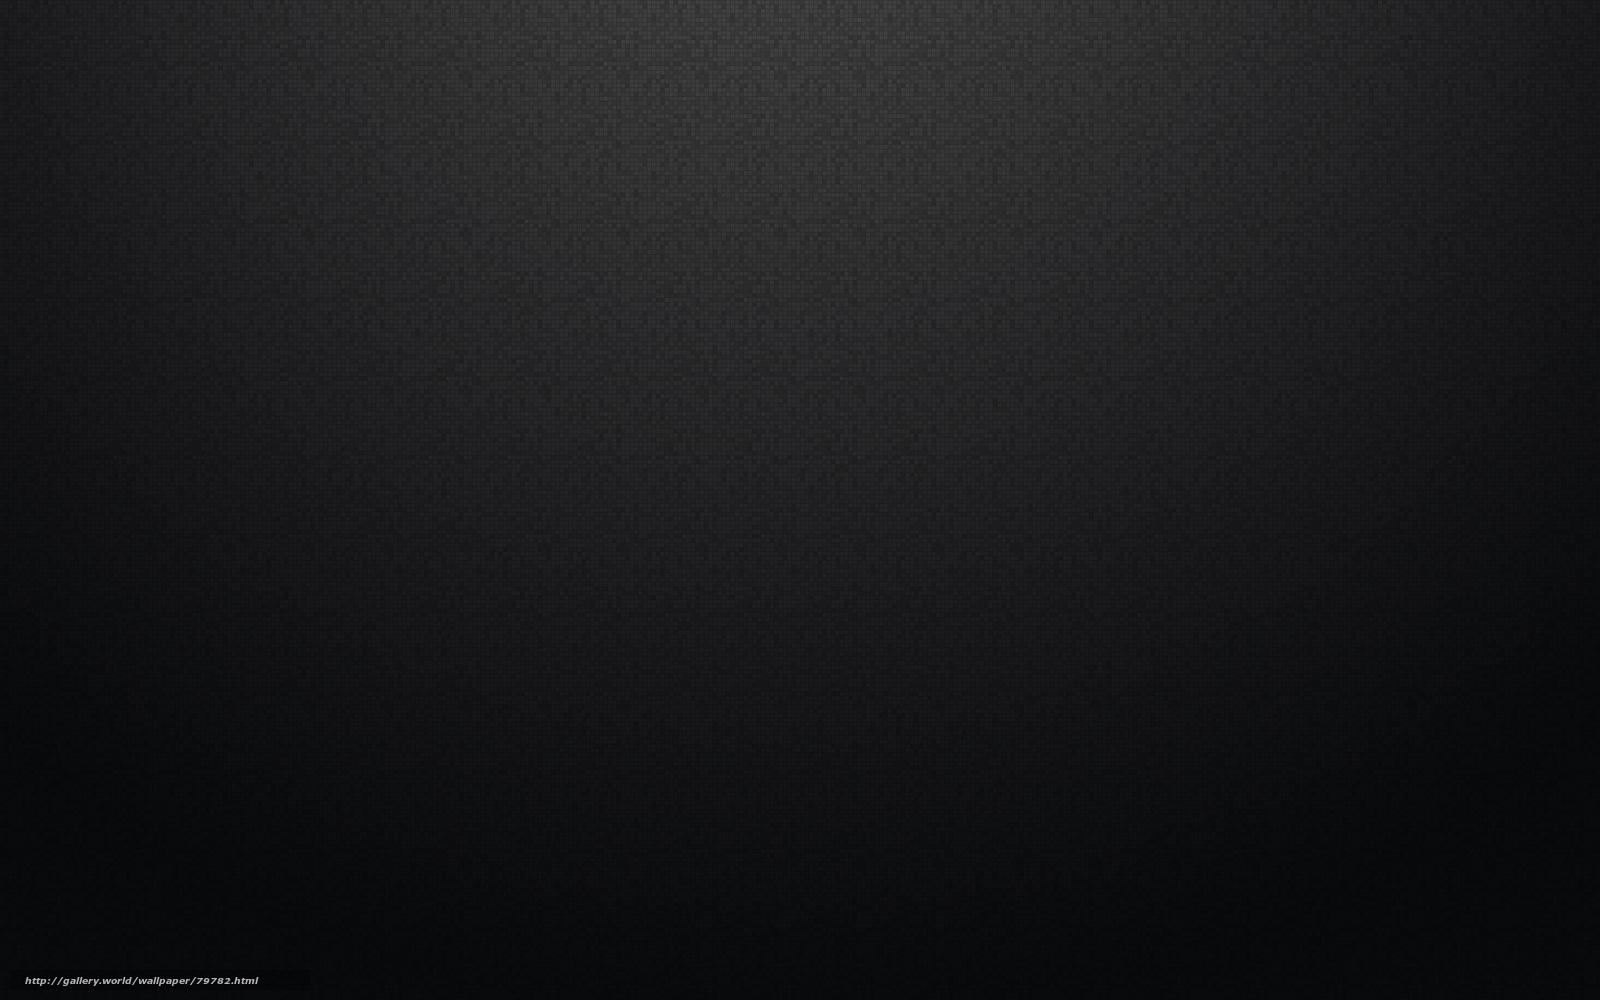 baixar wallpaper fundo preto - photo #1